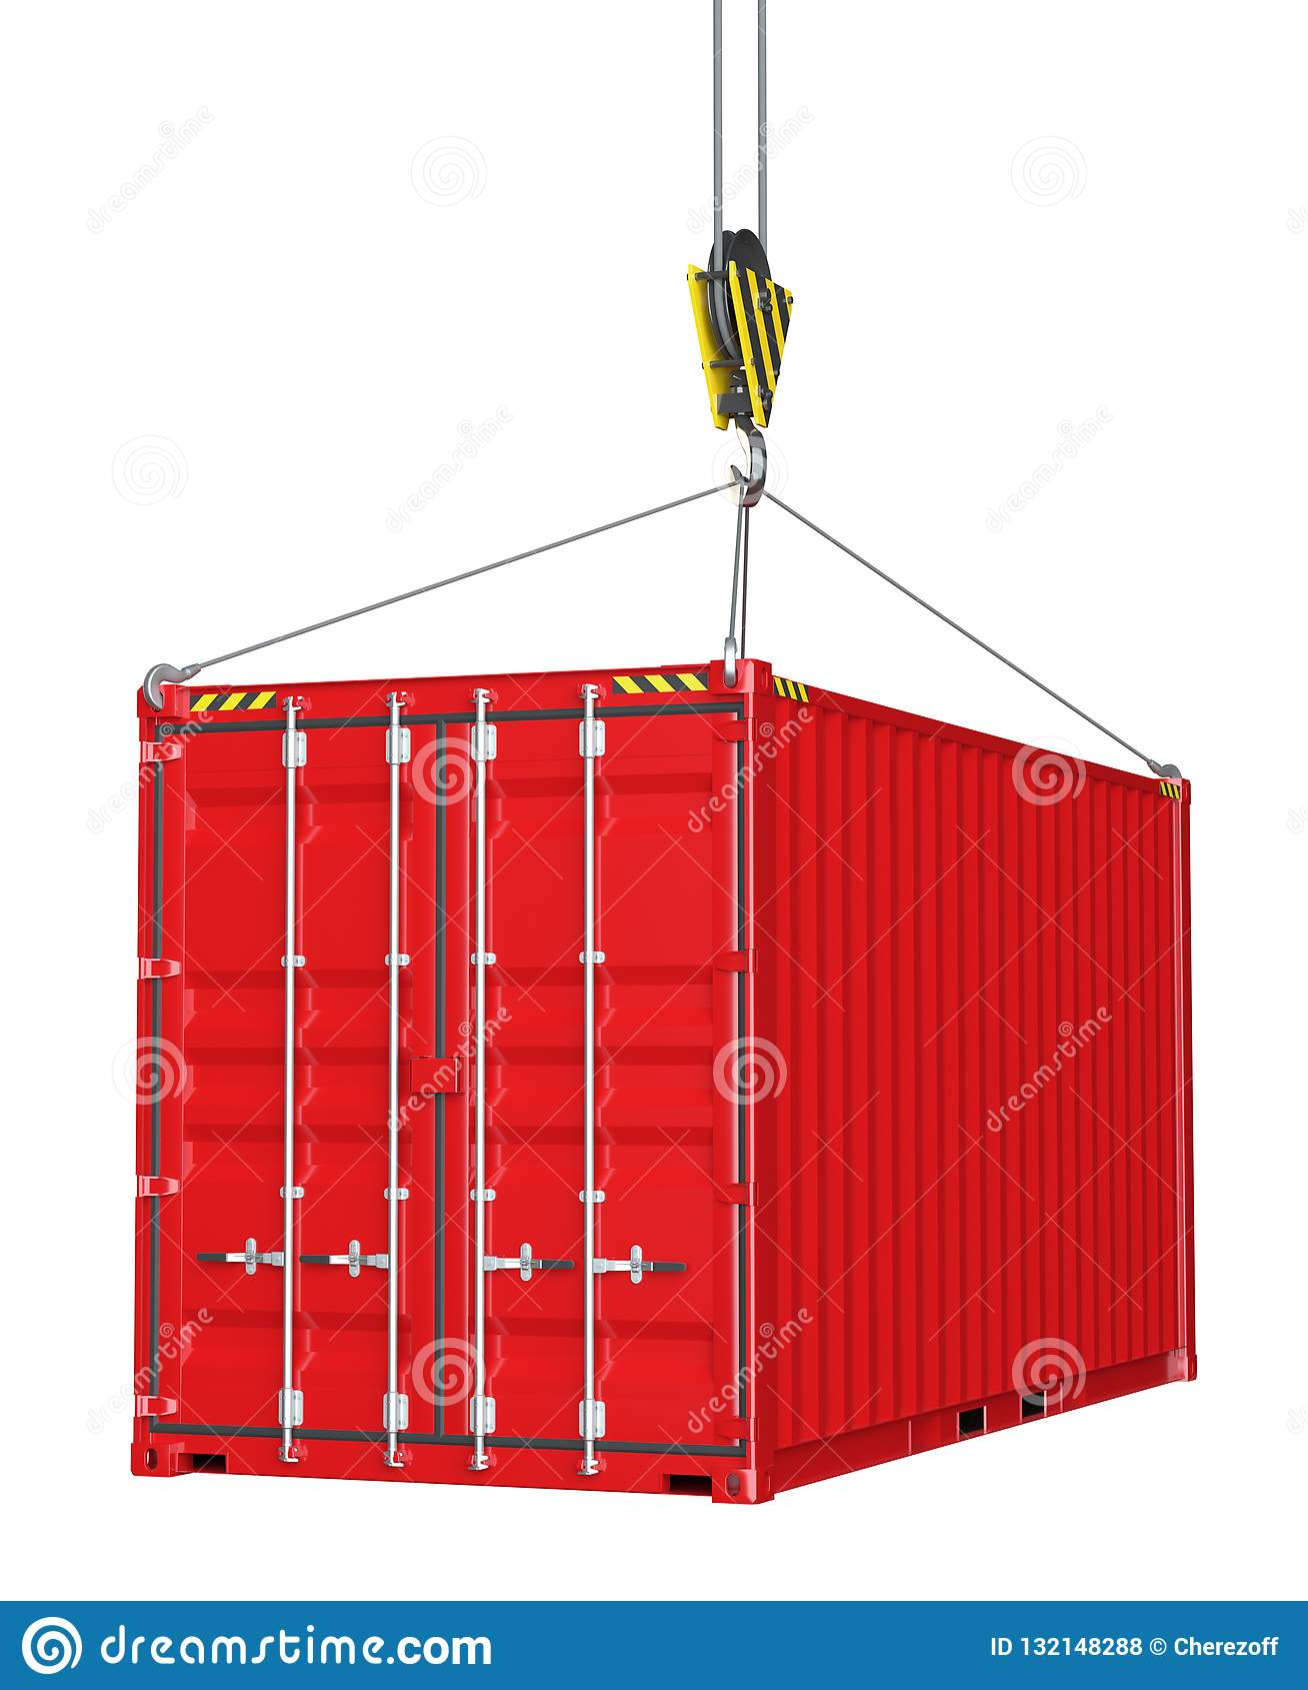 Serviceauslieferung - roter Frachtbehälter hochgezogen durch Haken